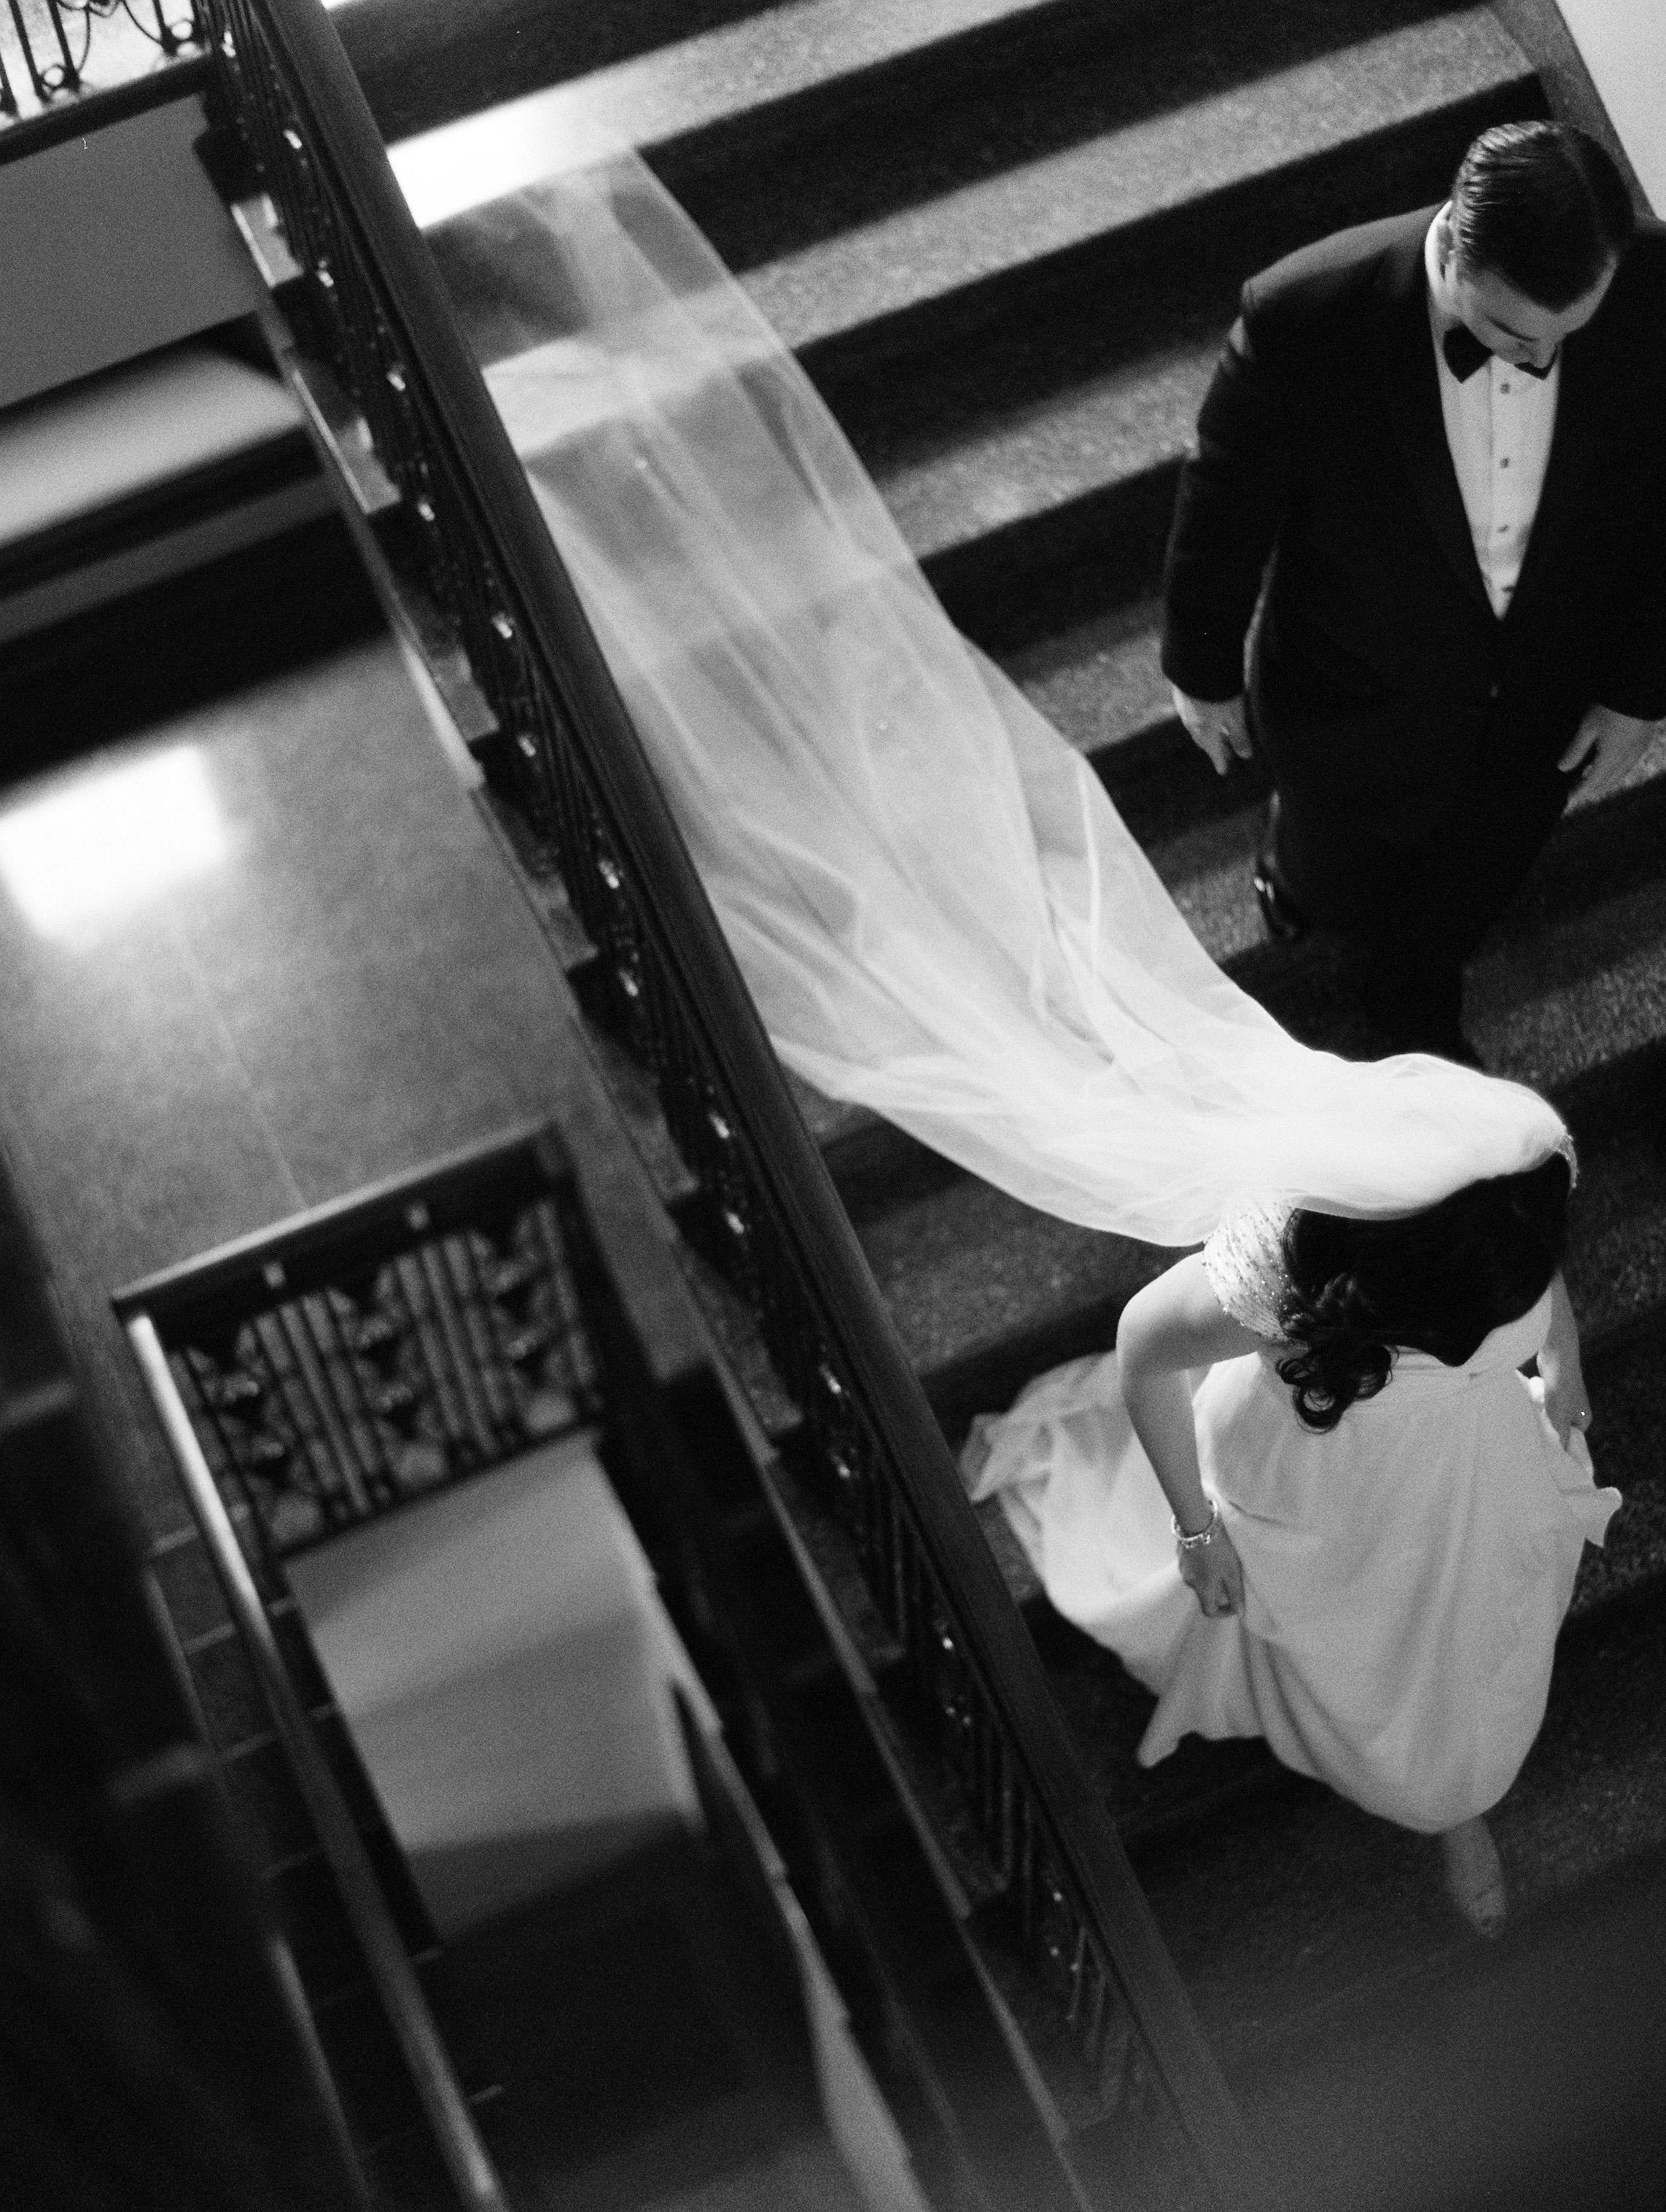 TOP DESTINATION WEDDING PHOTOGRAPHER, FILM WEDDING PHOTOGRAPHY WWW DOT LEXIAFRANK DOT COM